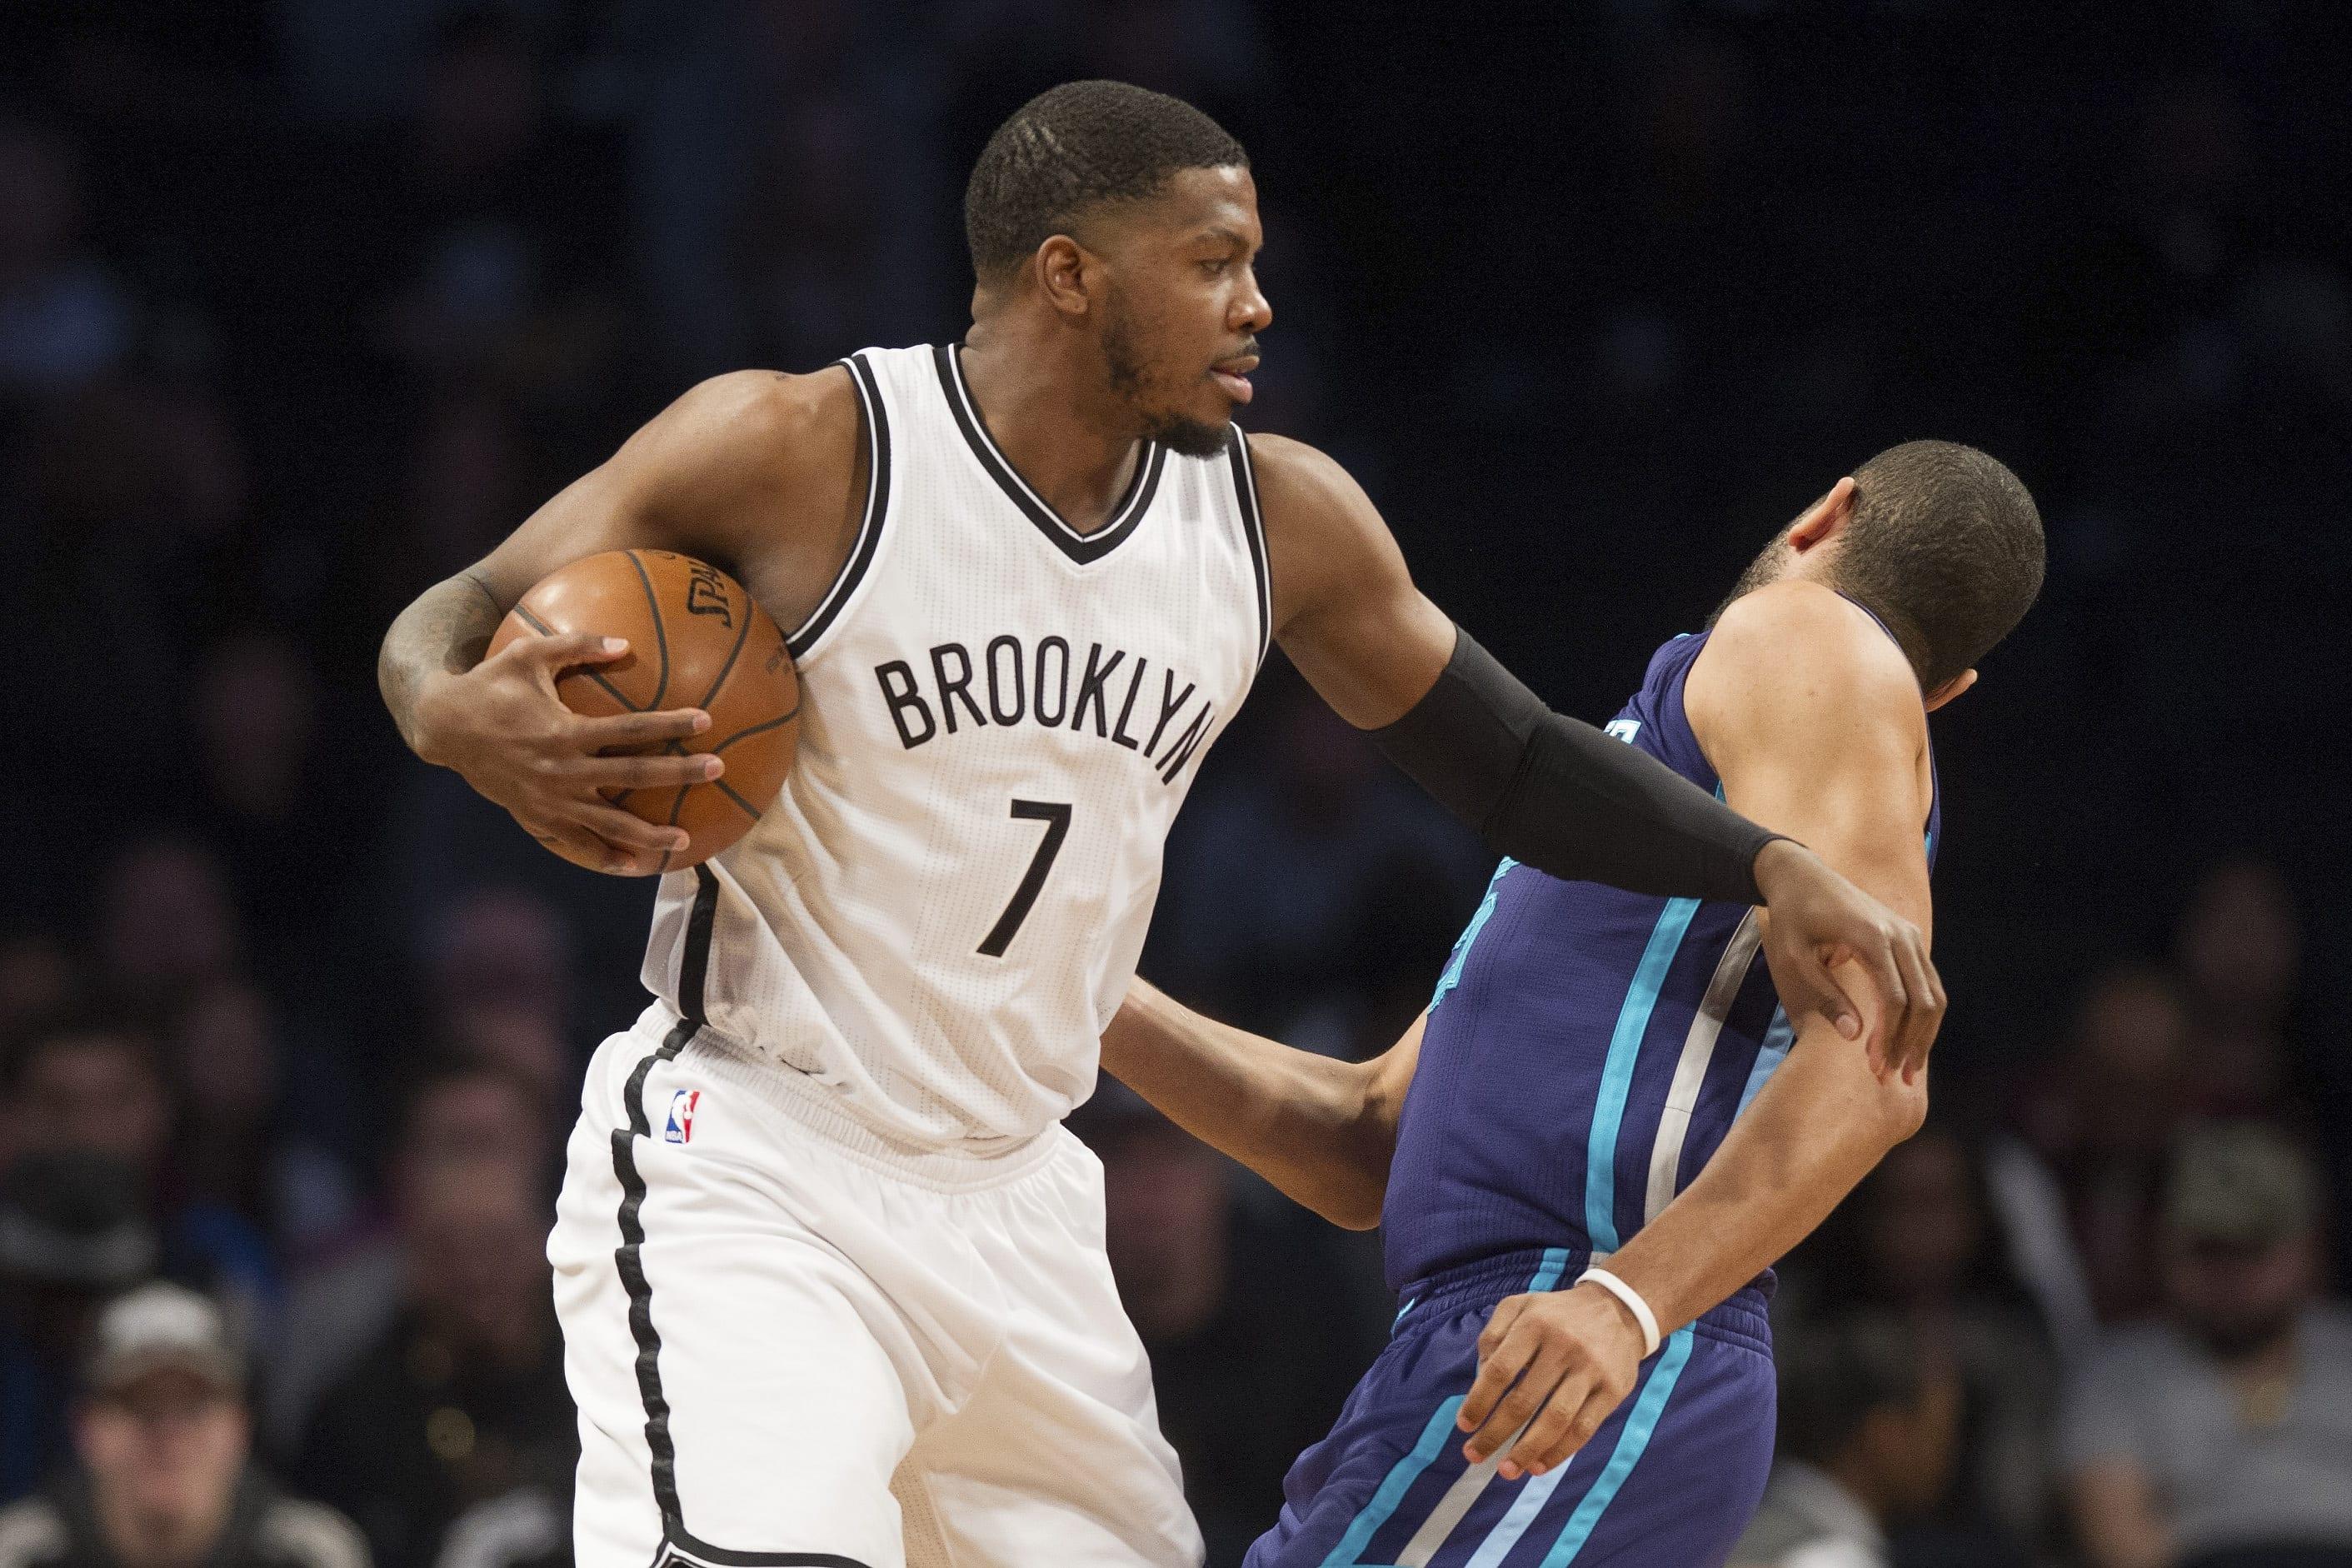 Brooklyn Nets, Joe Johnson